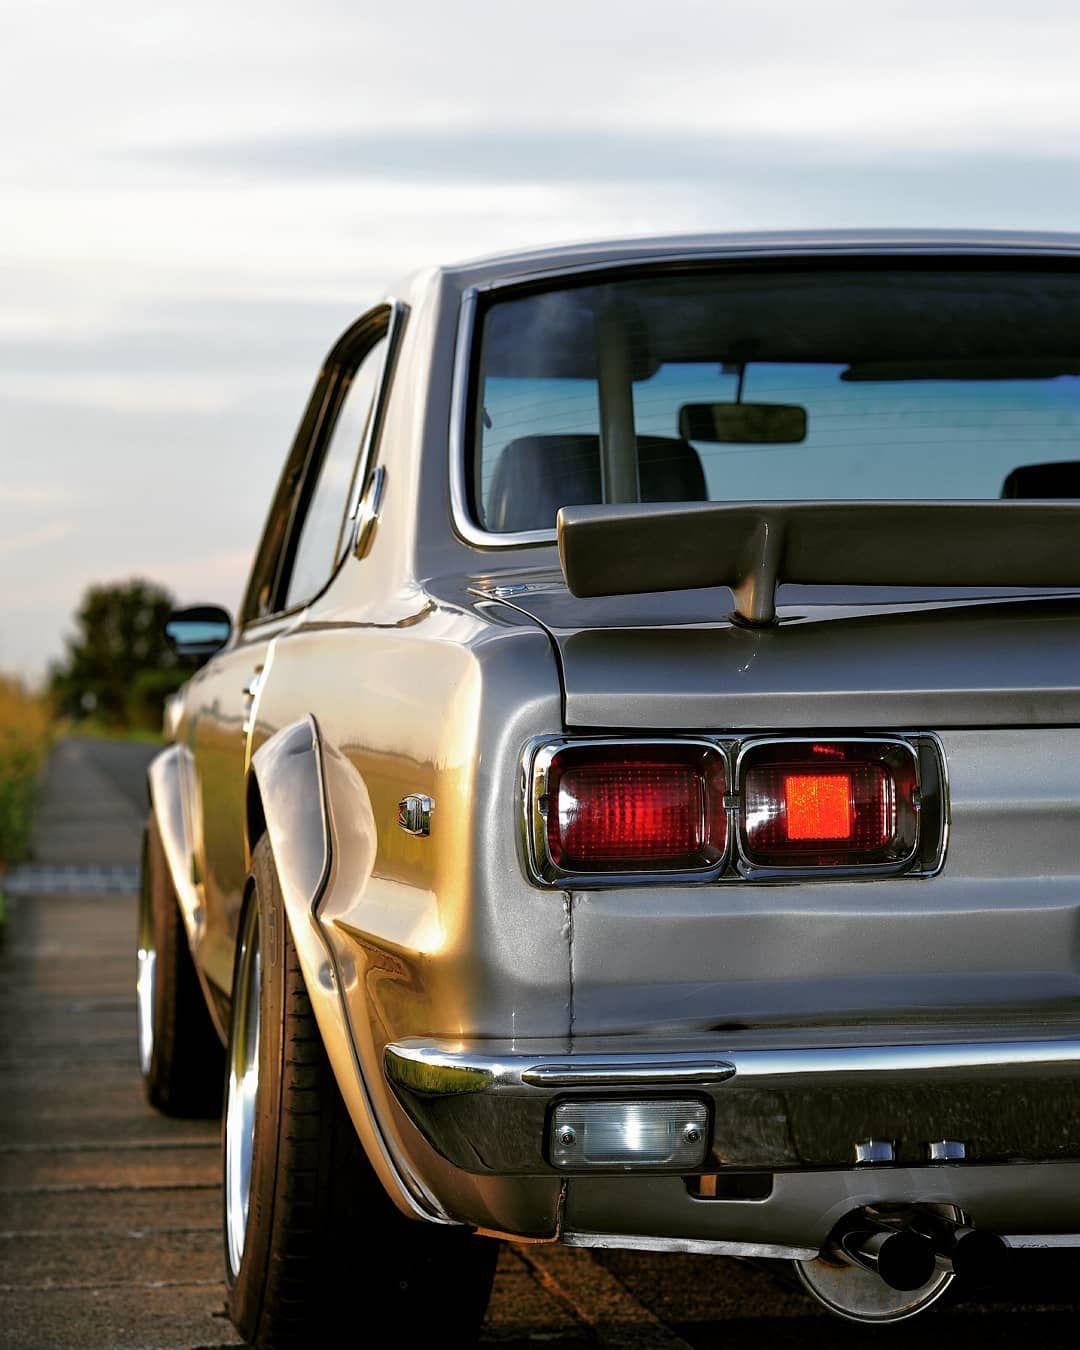 🔵 JDM real masterpiece 🚗 1972 Nissan Skyline HAKOSUKA 🏁 ...  1972 Nissan Skyline Jdm